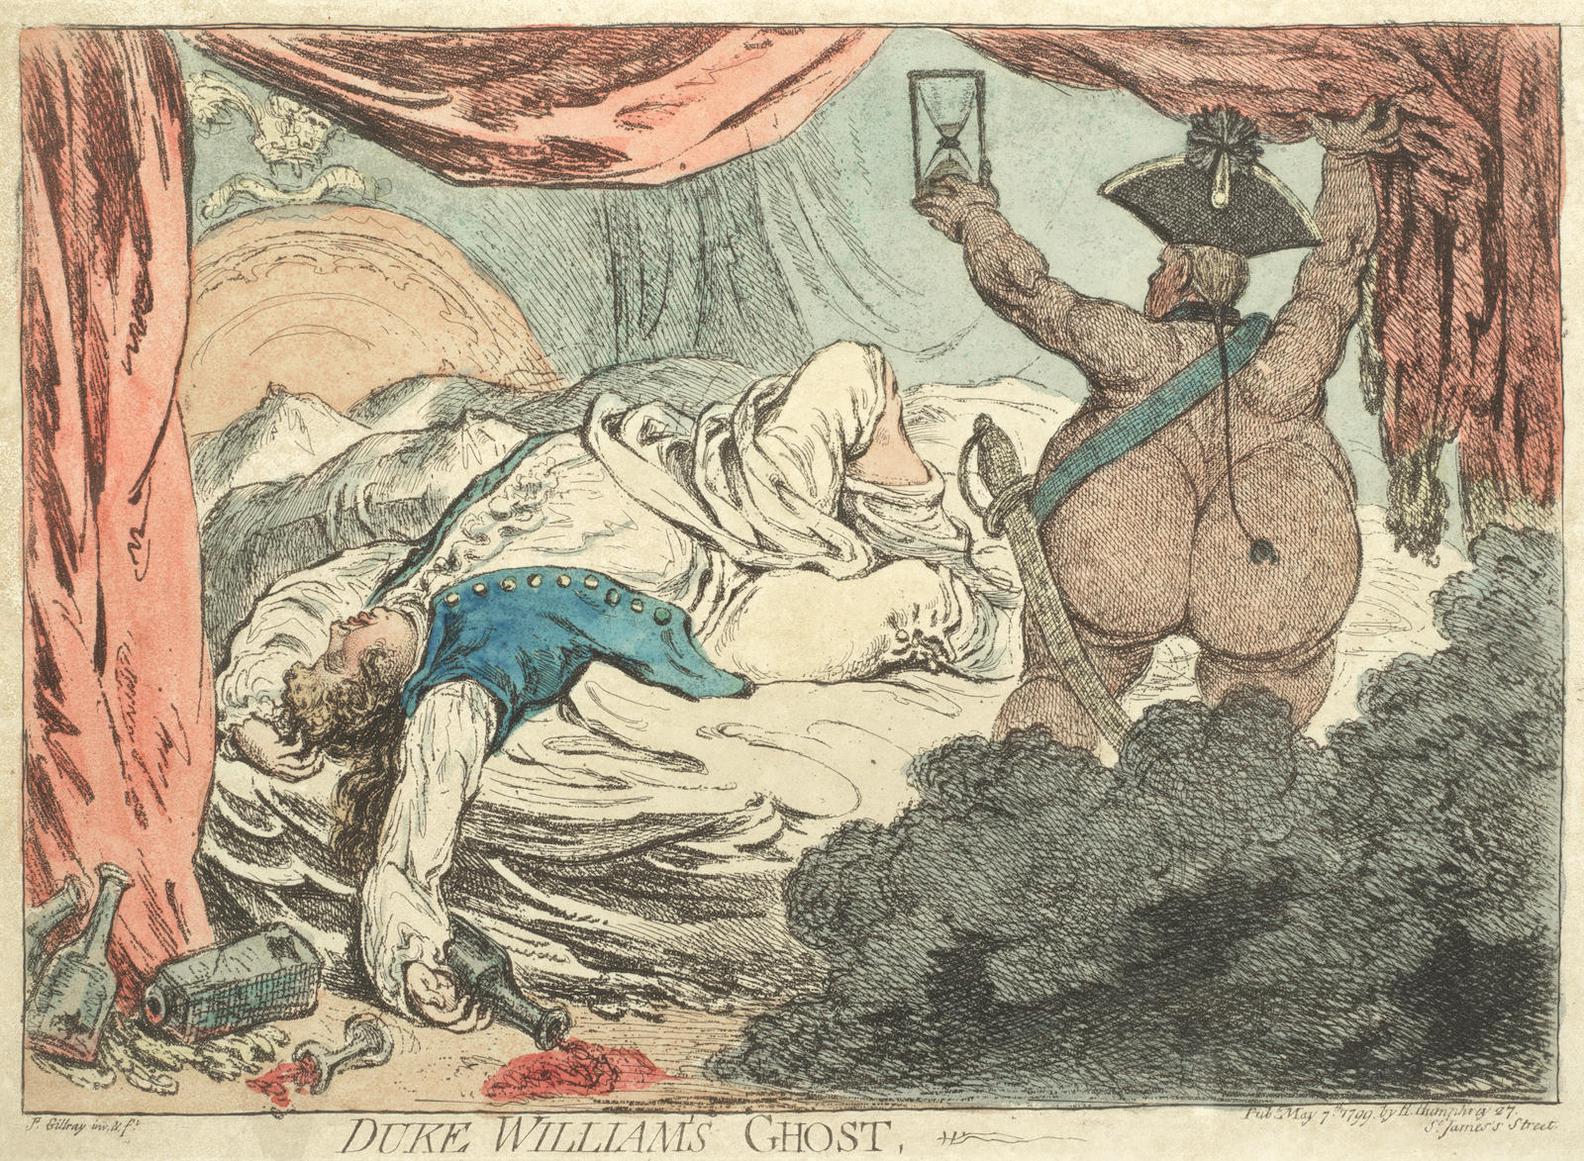 James Gillray-Duke Williams Ghost-1799